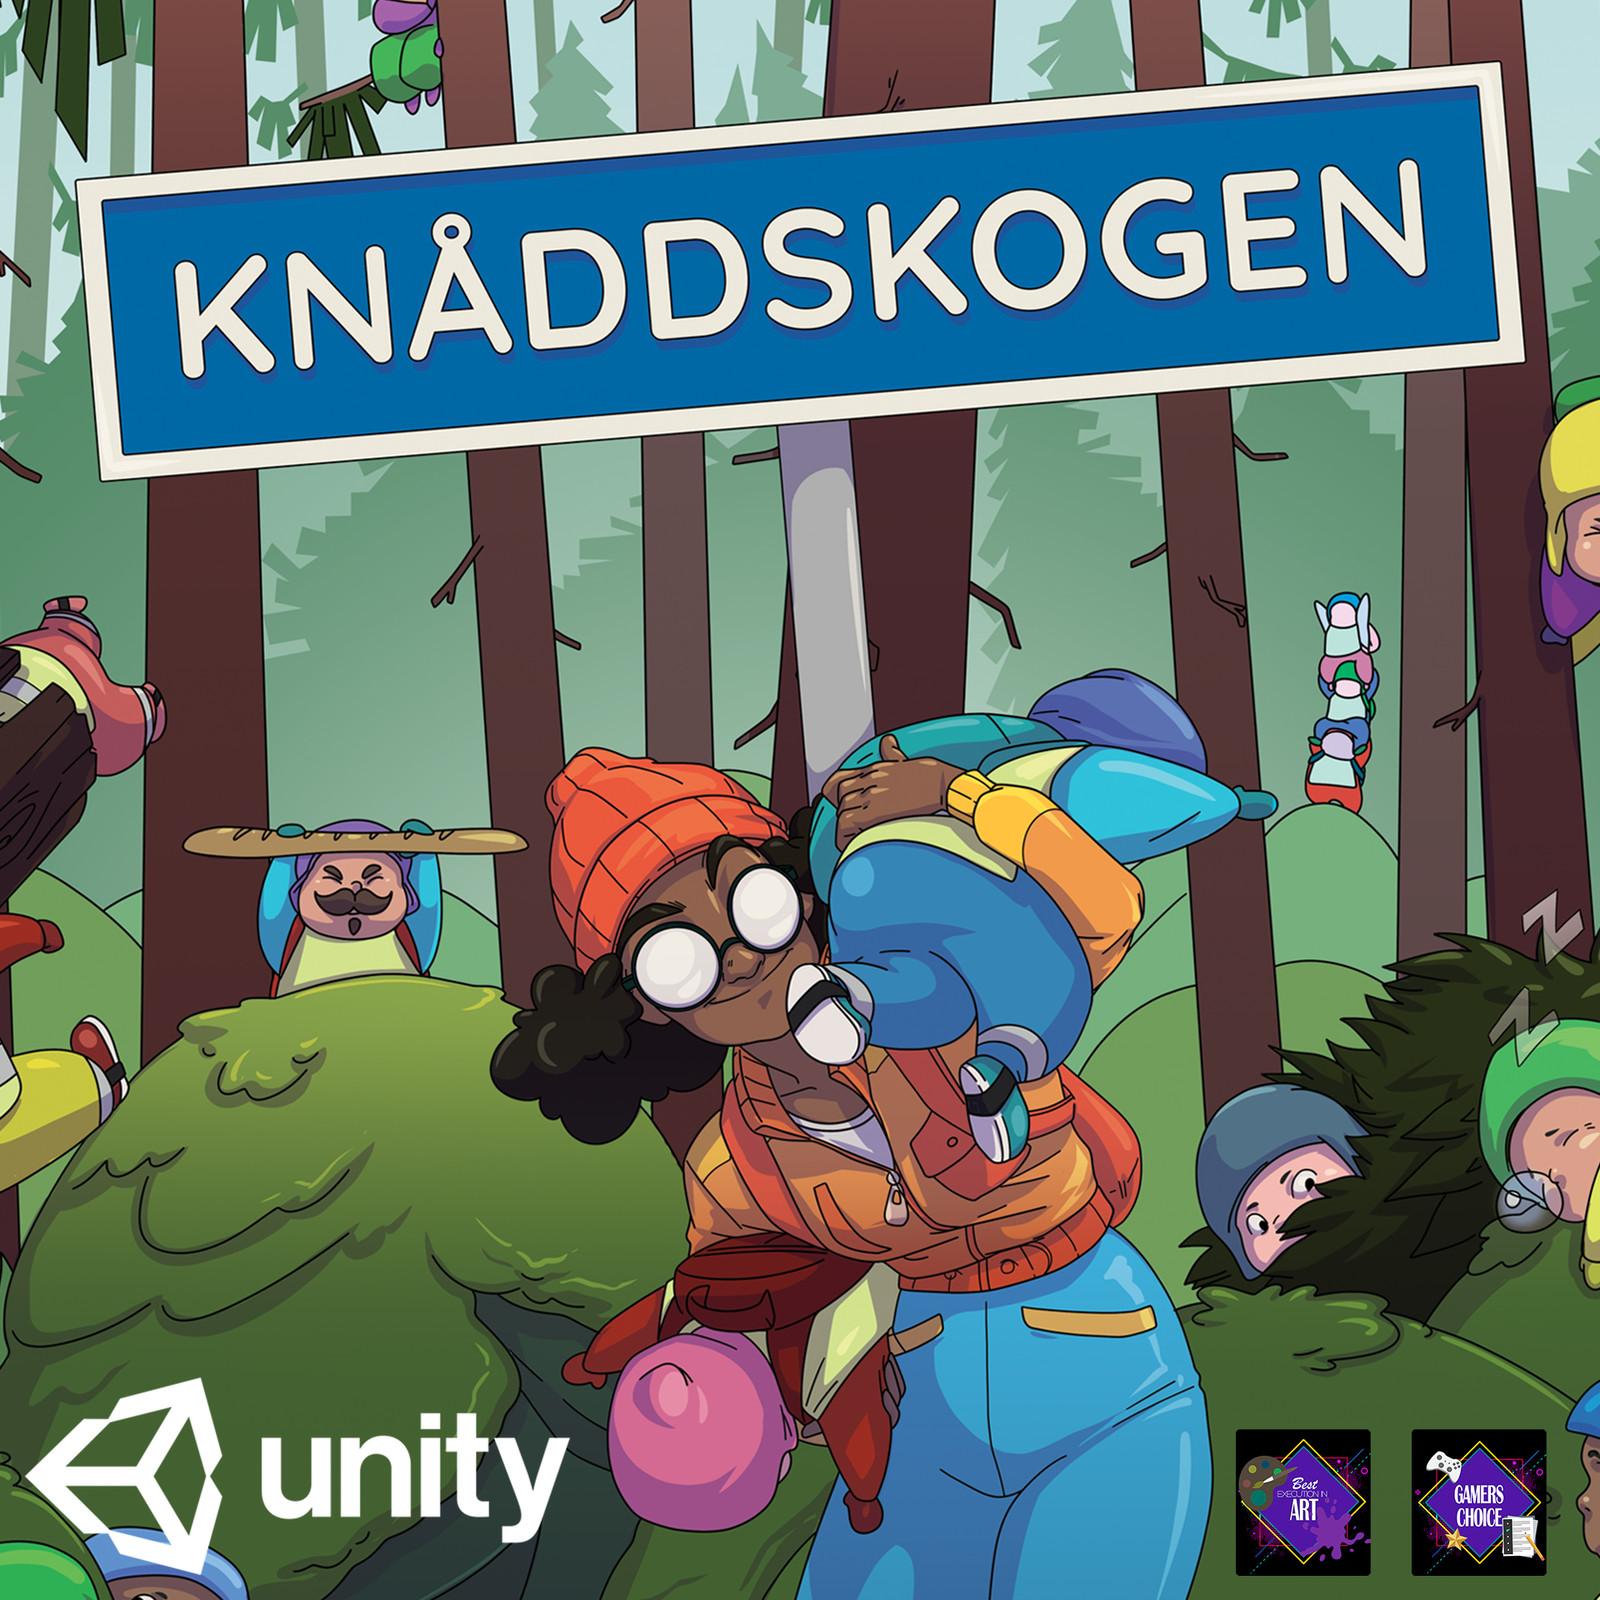 Knåddskogen - Game Project